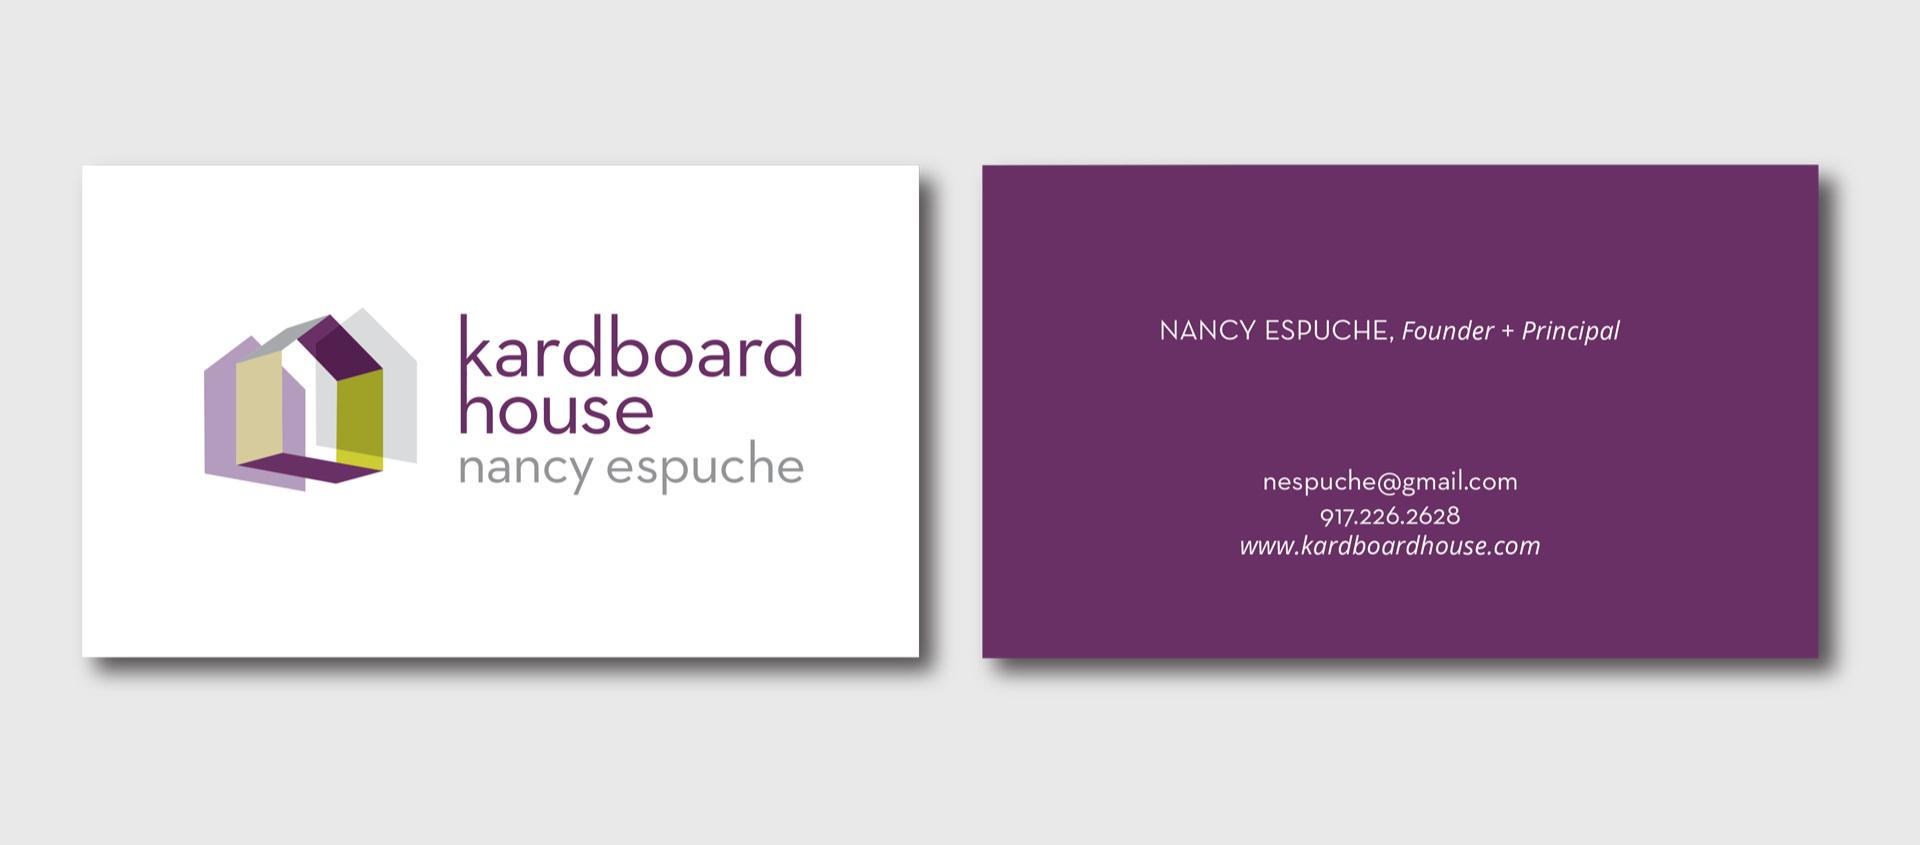 Kardboard-House-Business-Card.jpg